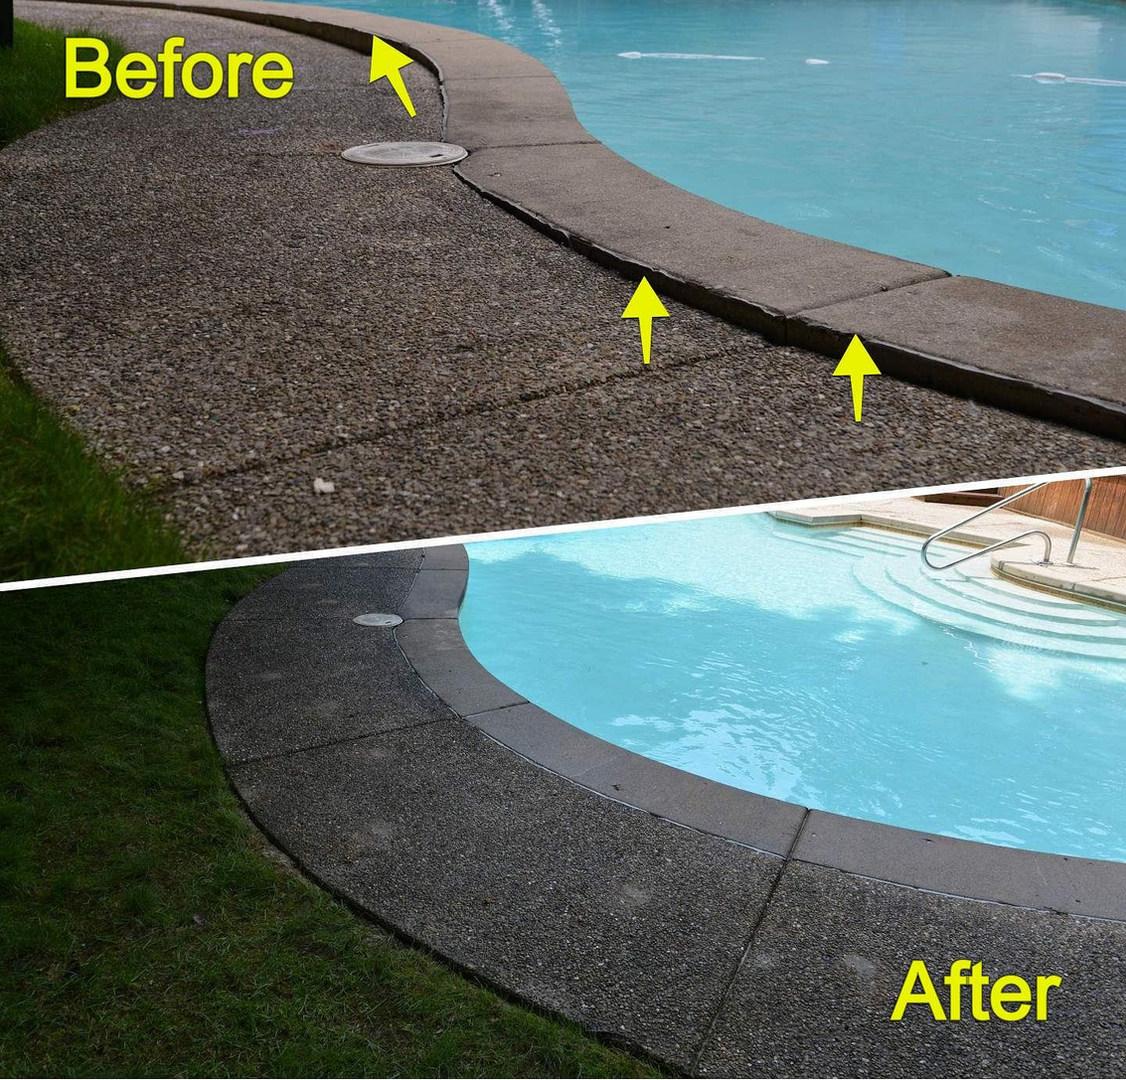 Eliminating Tripping Hazards around the Pool